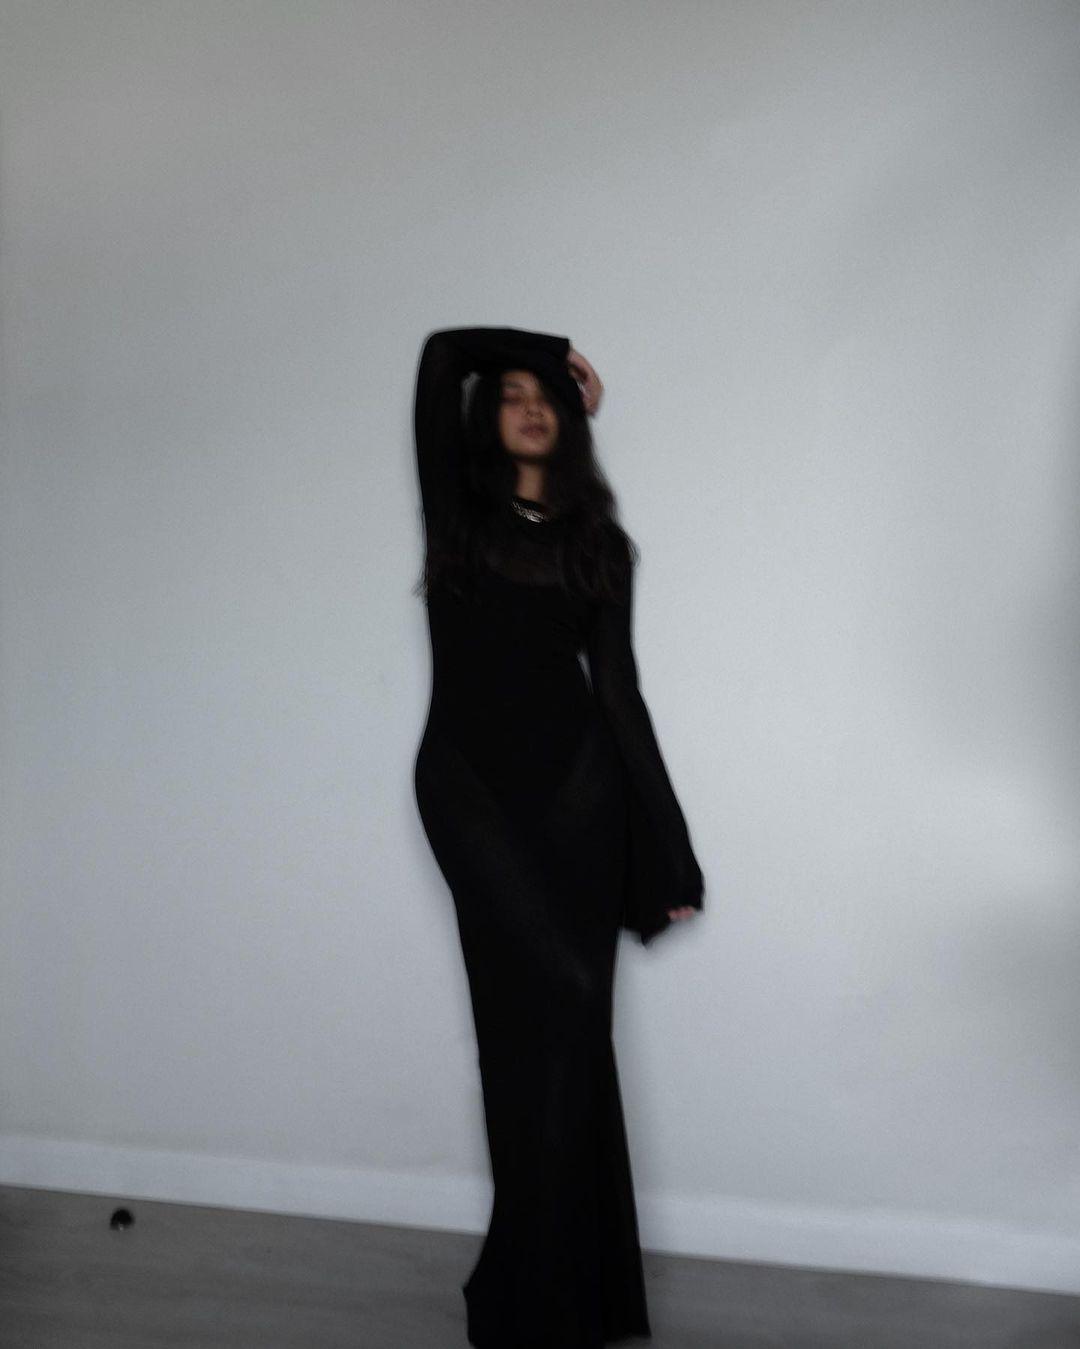 angelique manto black ootds